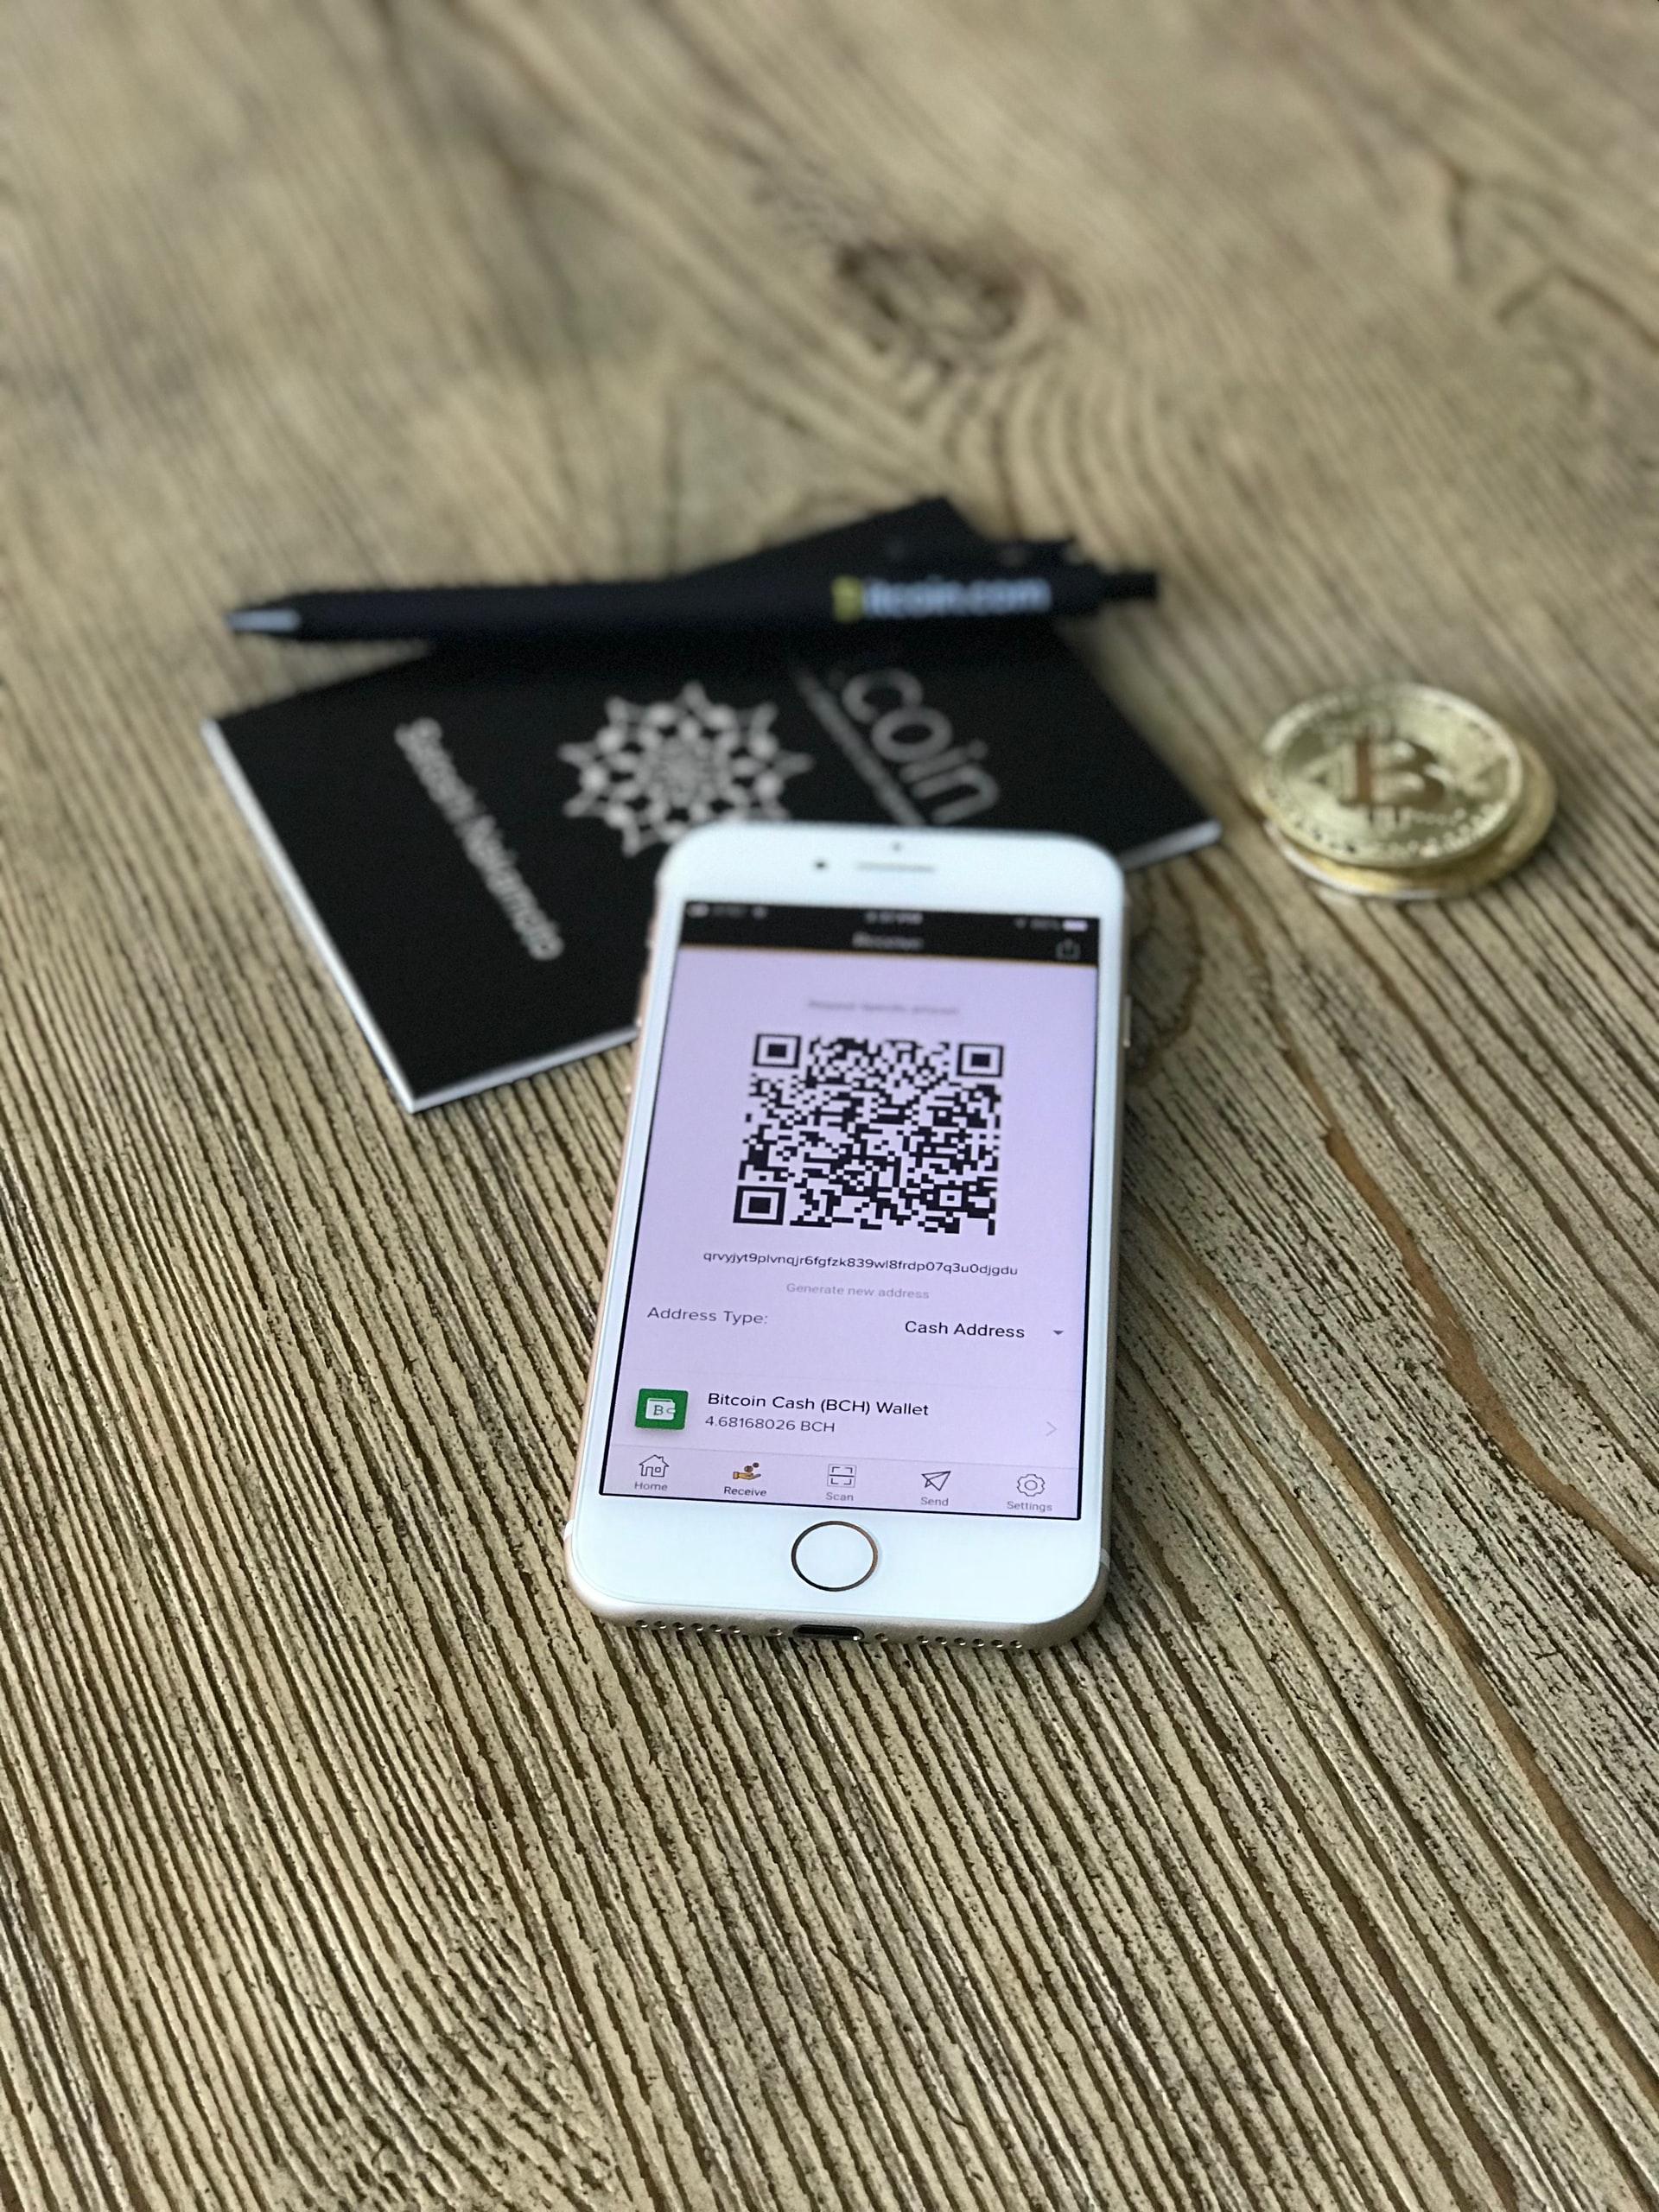 A payment platform on a smartphone